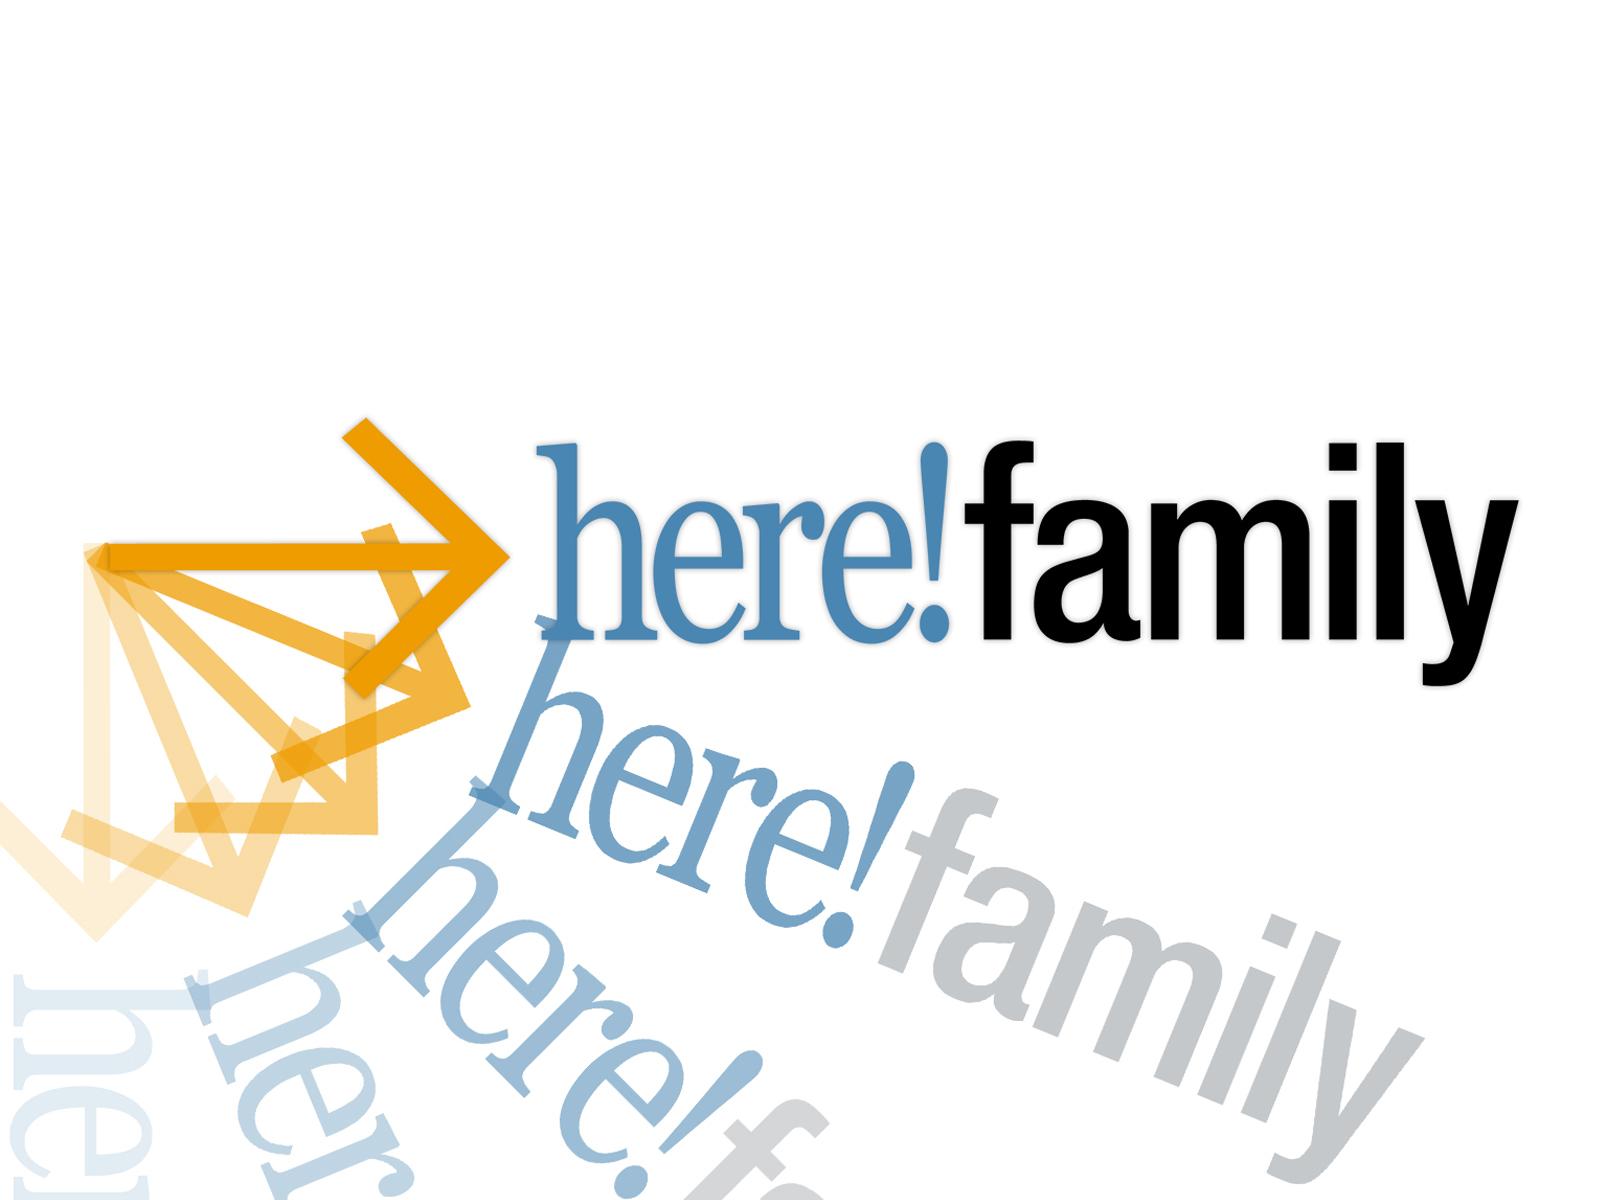 Here-HereFamilyS1-Full-Image-en-US.jpg